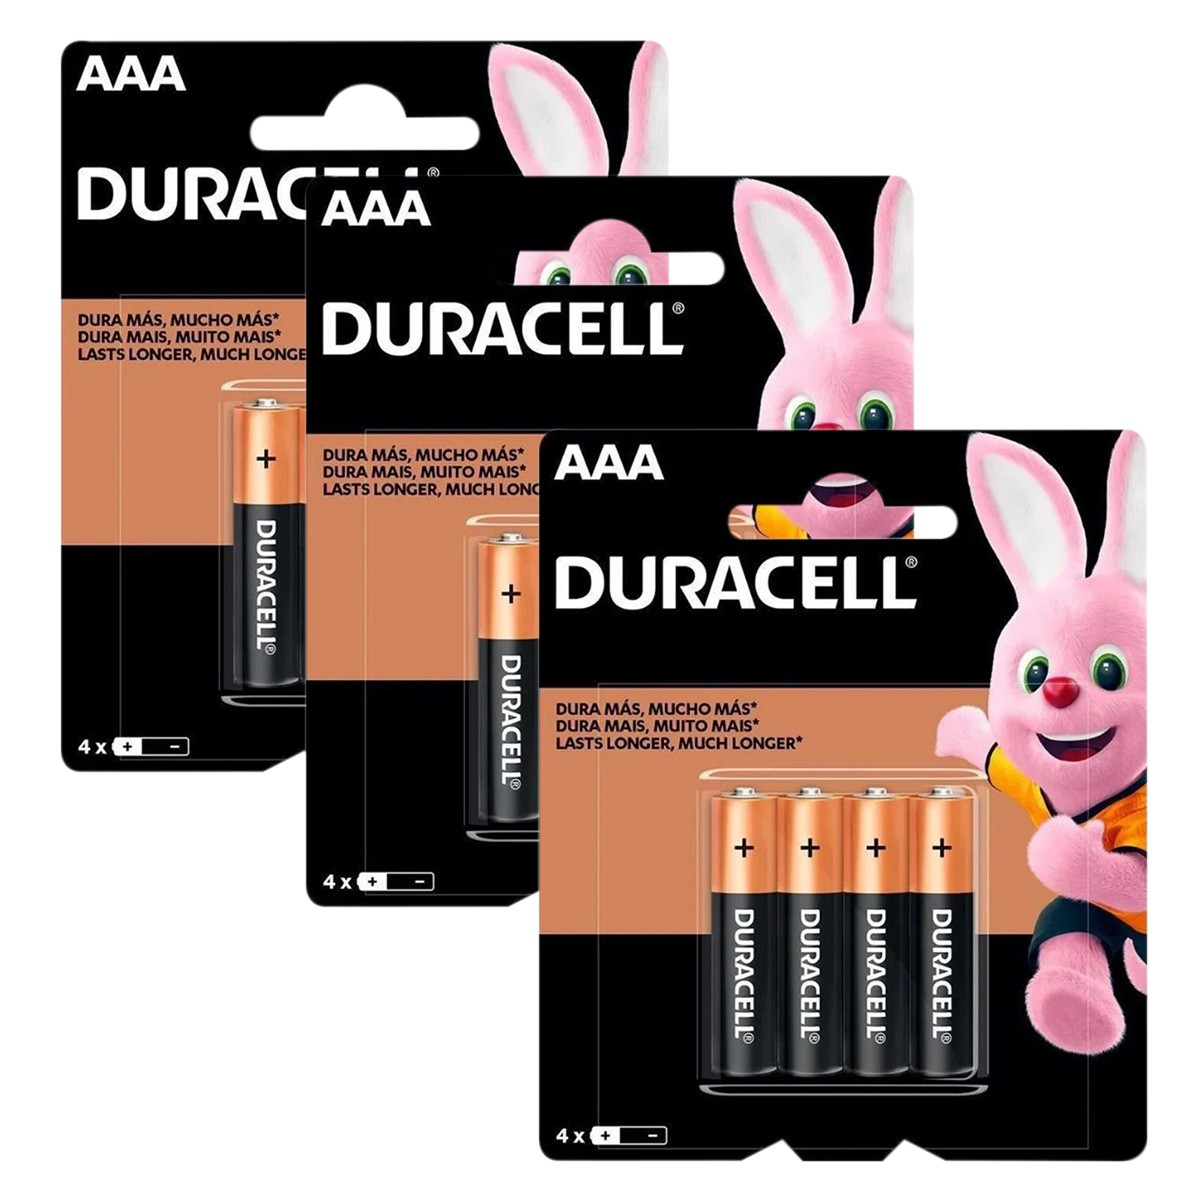 12 Pilhas DURACELL DURALOCK Alcalina AAA Embalagem C/4 Unids